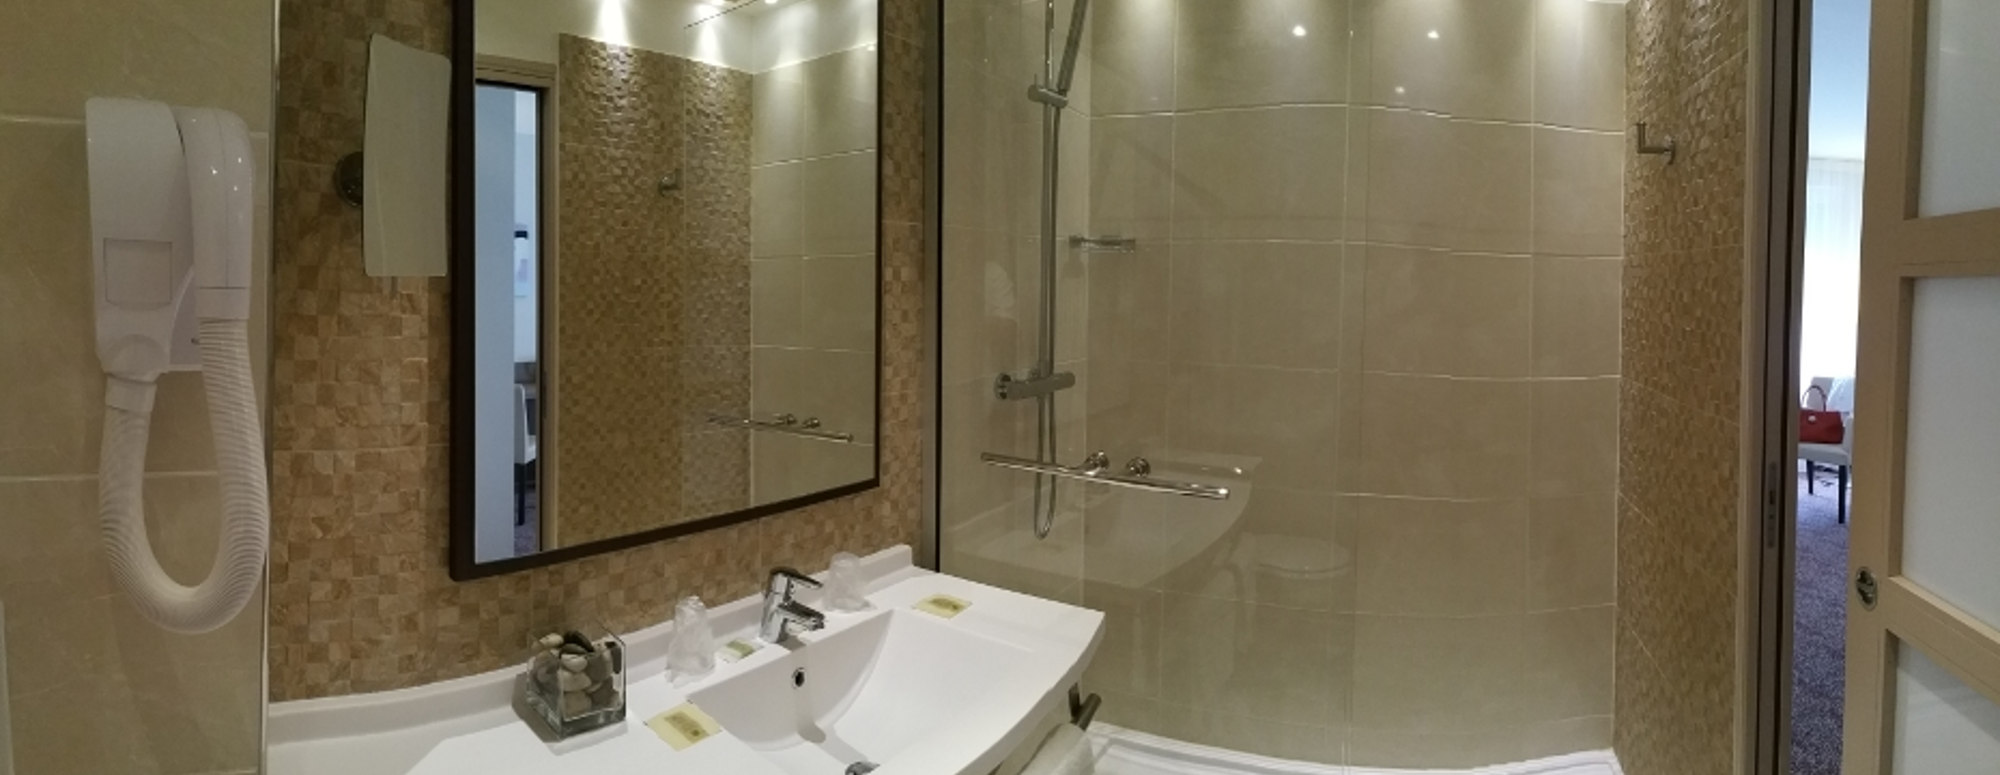 salle de bain chambre standing hotel 3 etoiles chateaudun